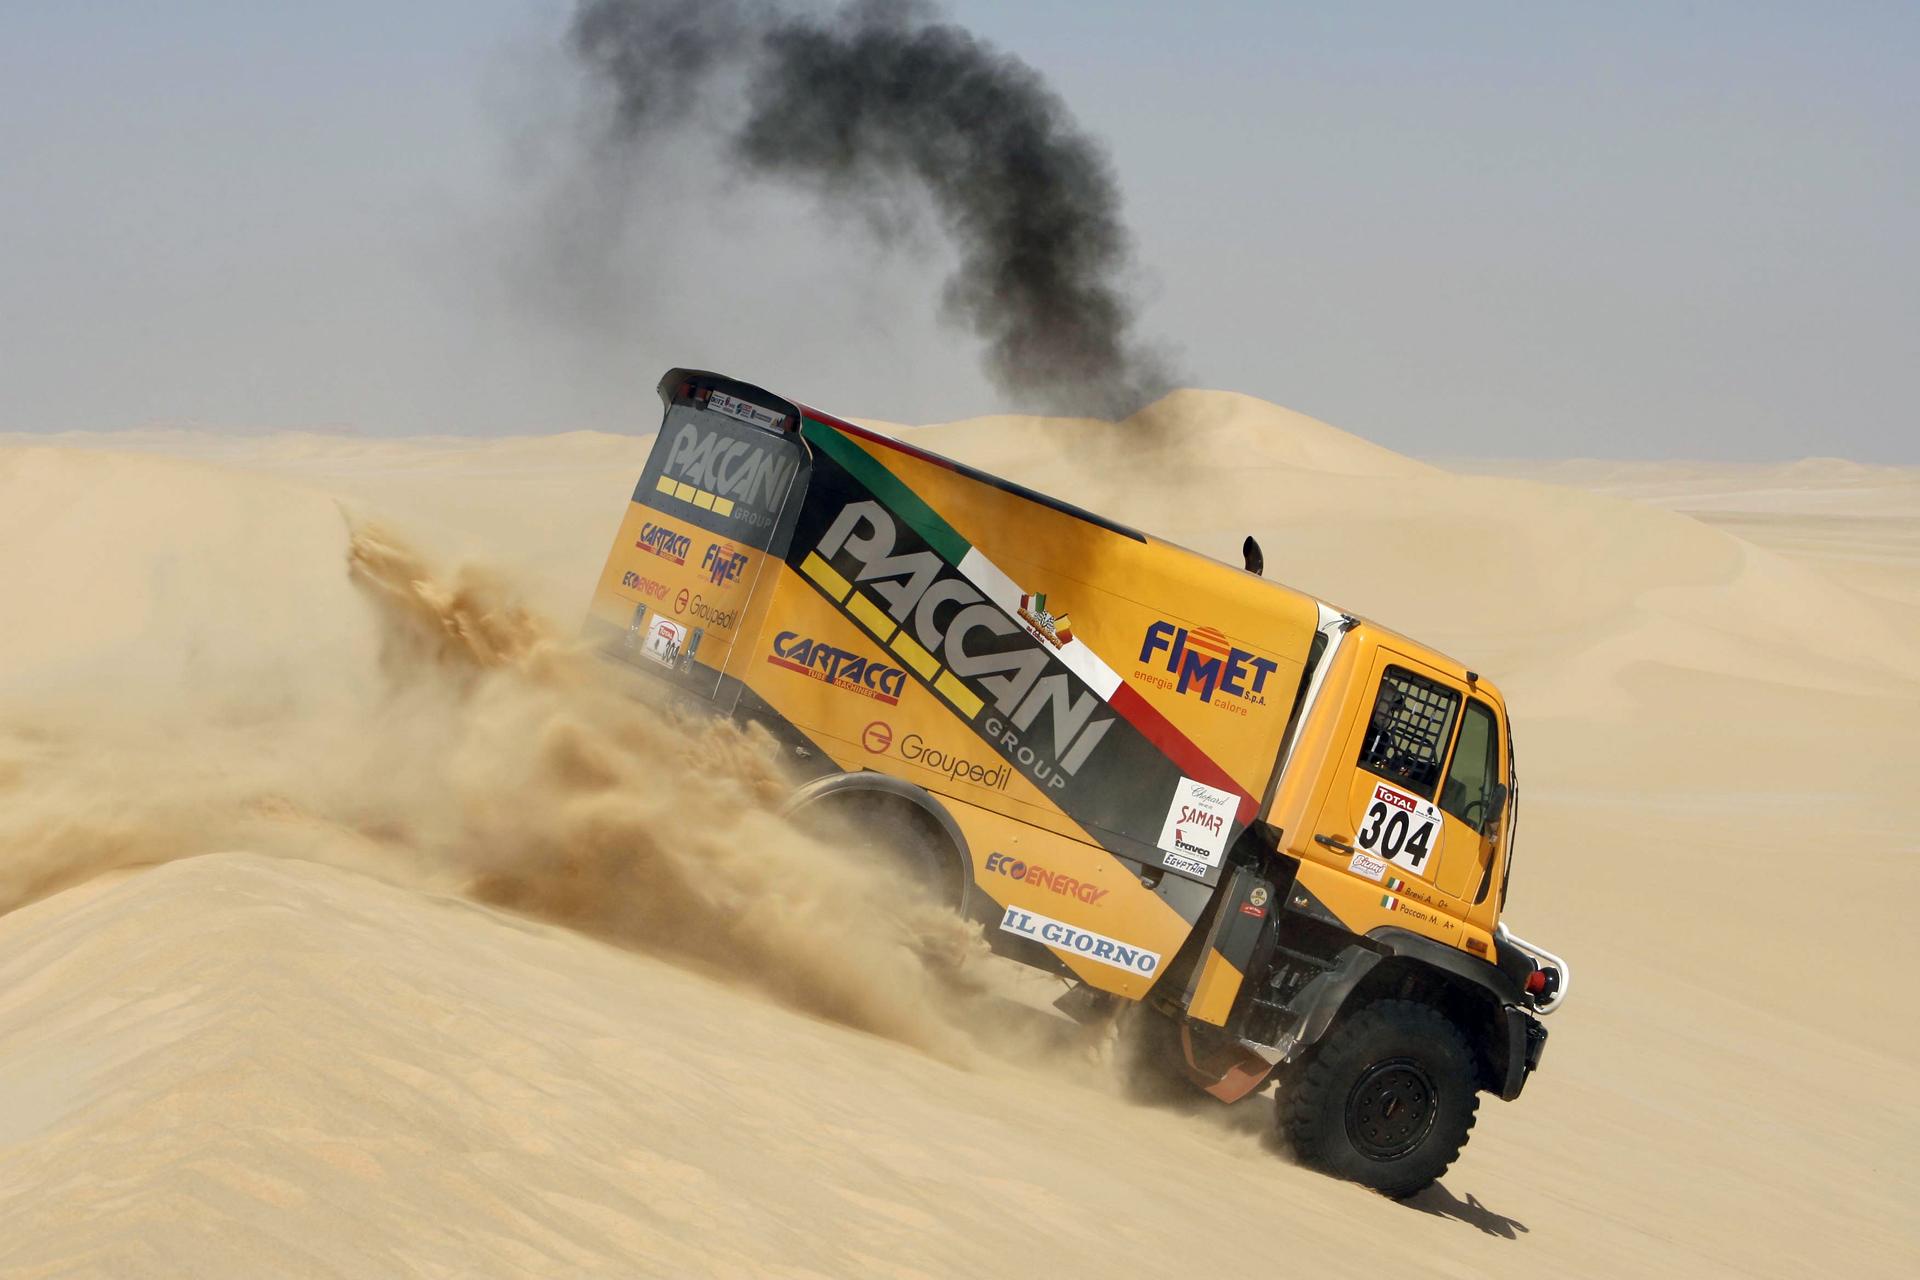 Mercedes-Benz Unimog Dakar photos - PhotoGallery with 8 ...